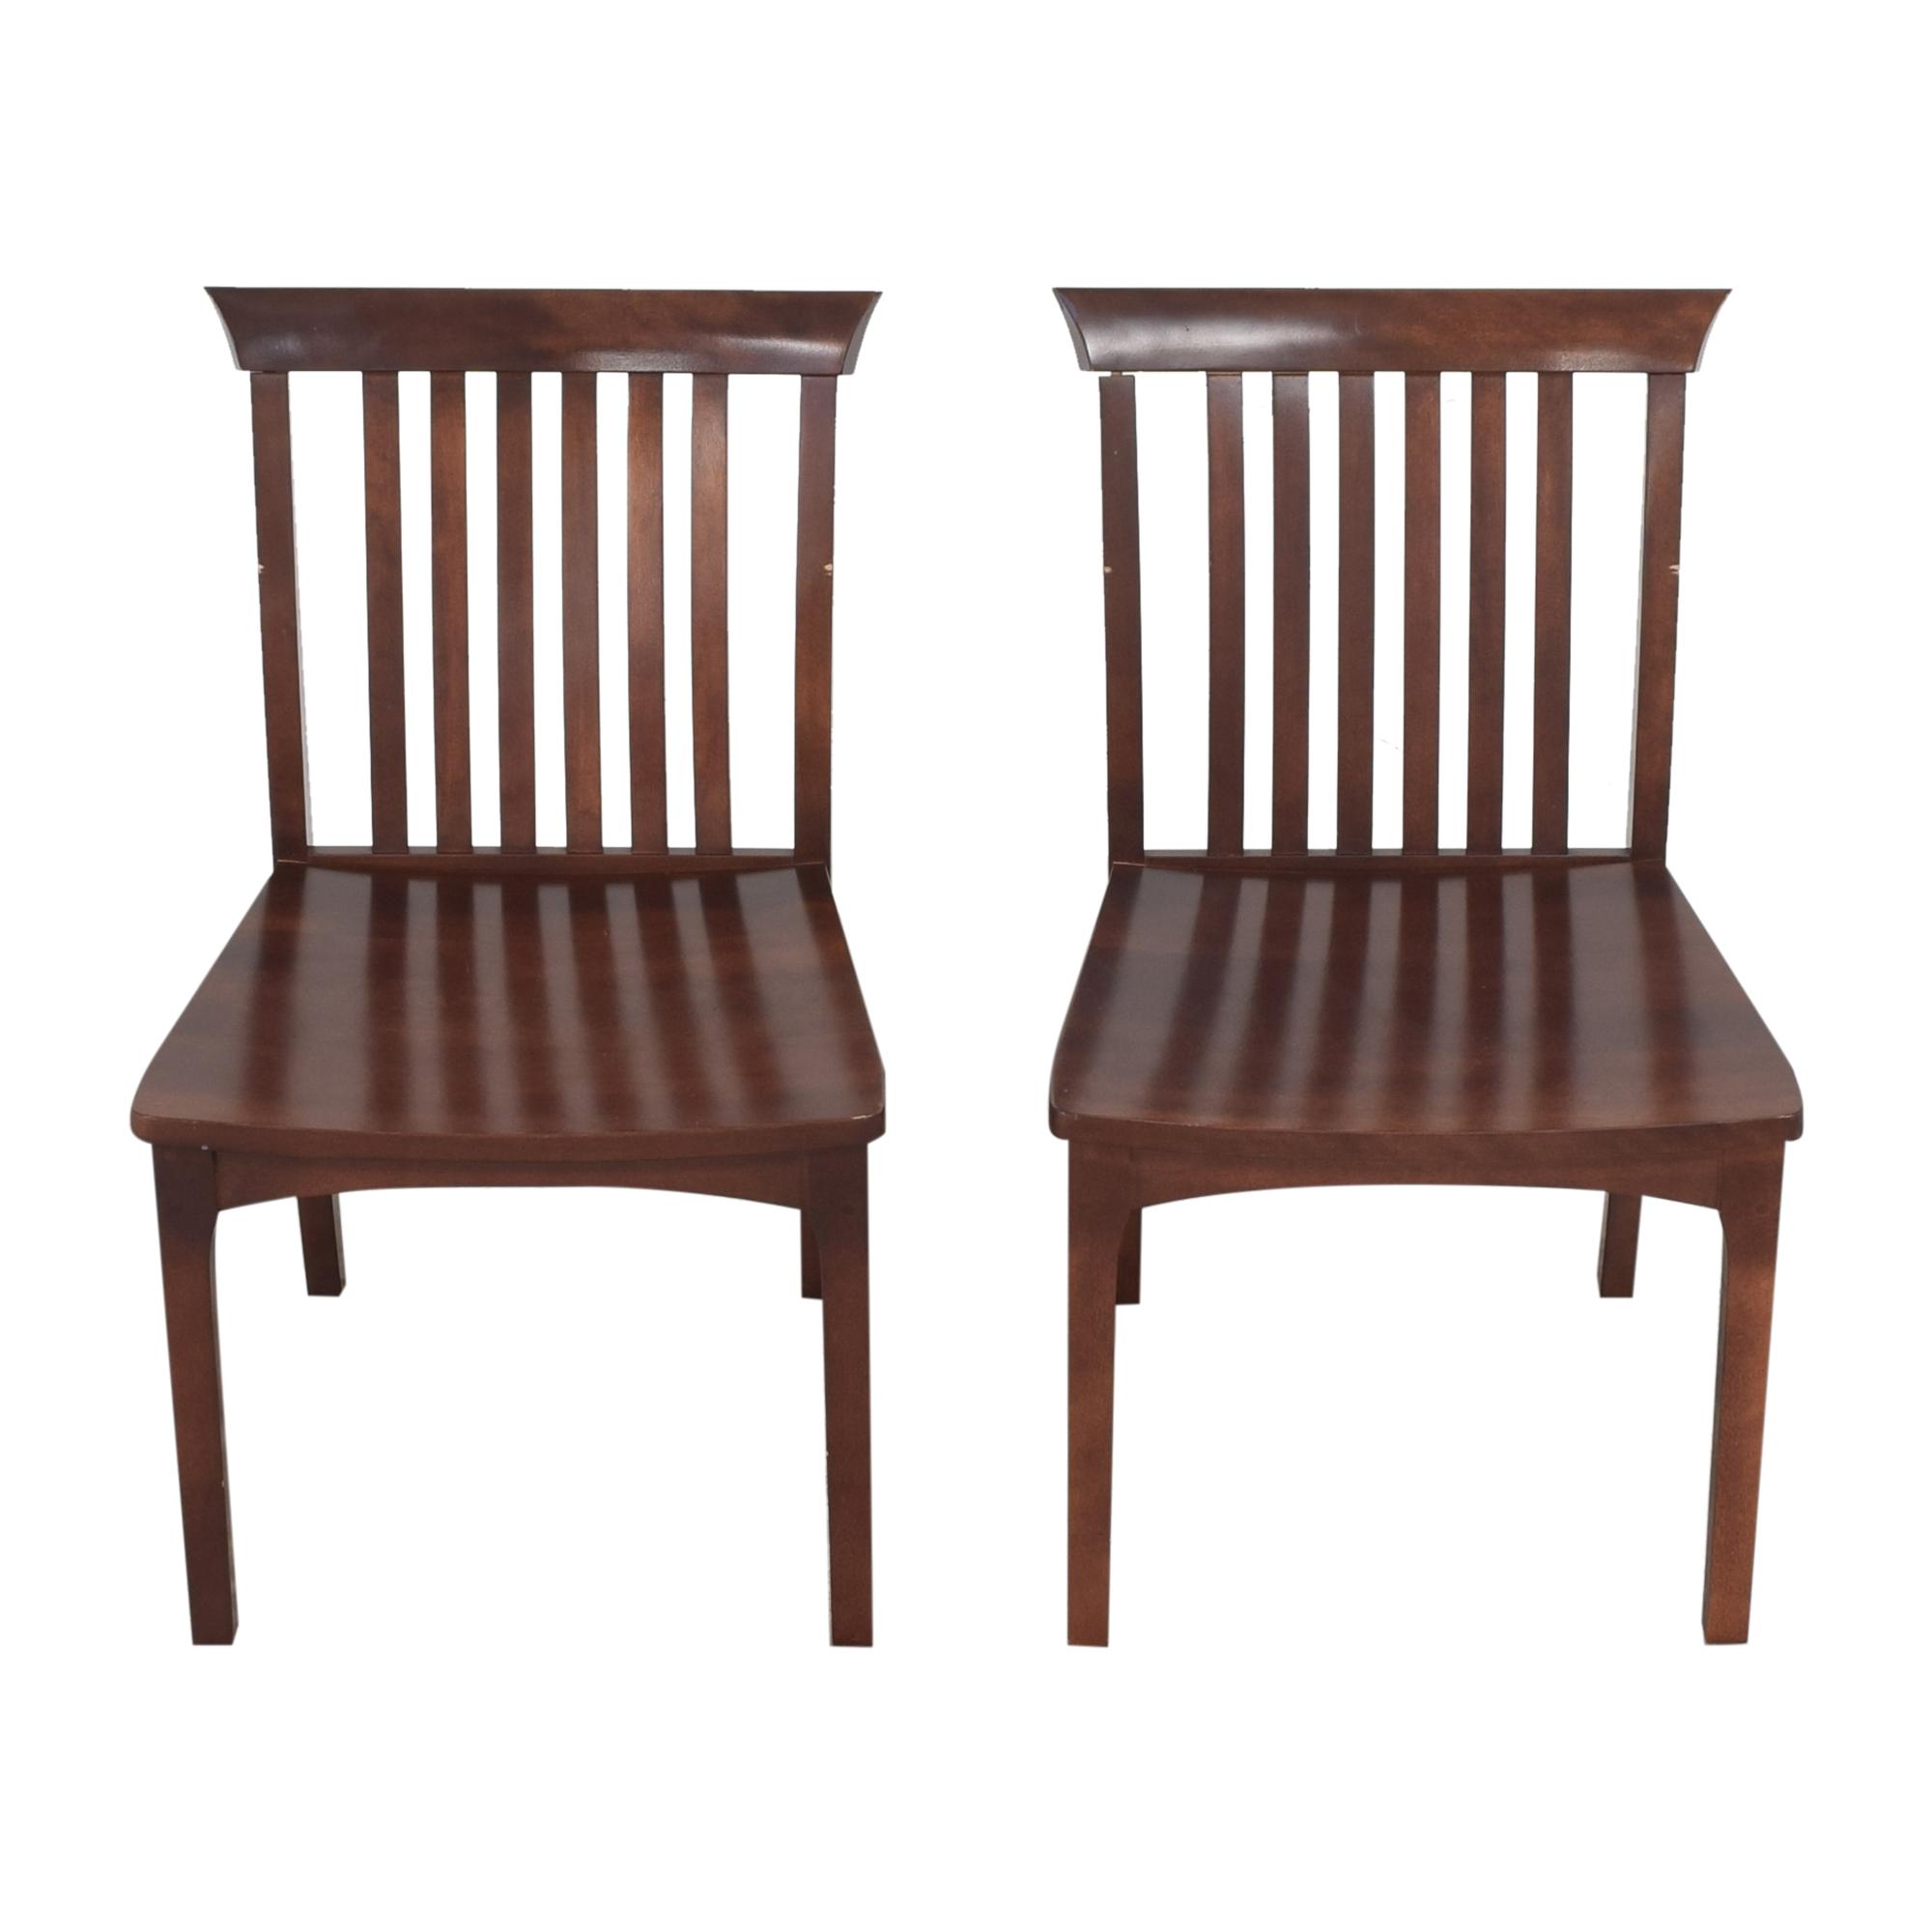 Pompanoosuc Mills Pompanoosuc Mills Goddard Dining Side Chairs brown